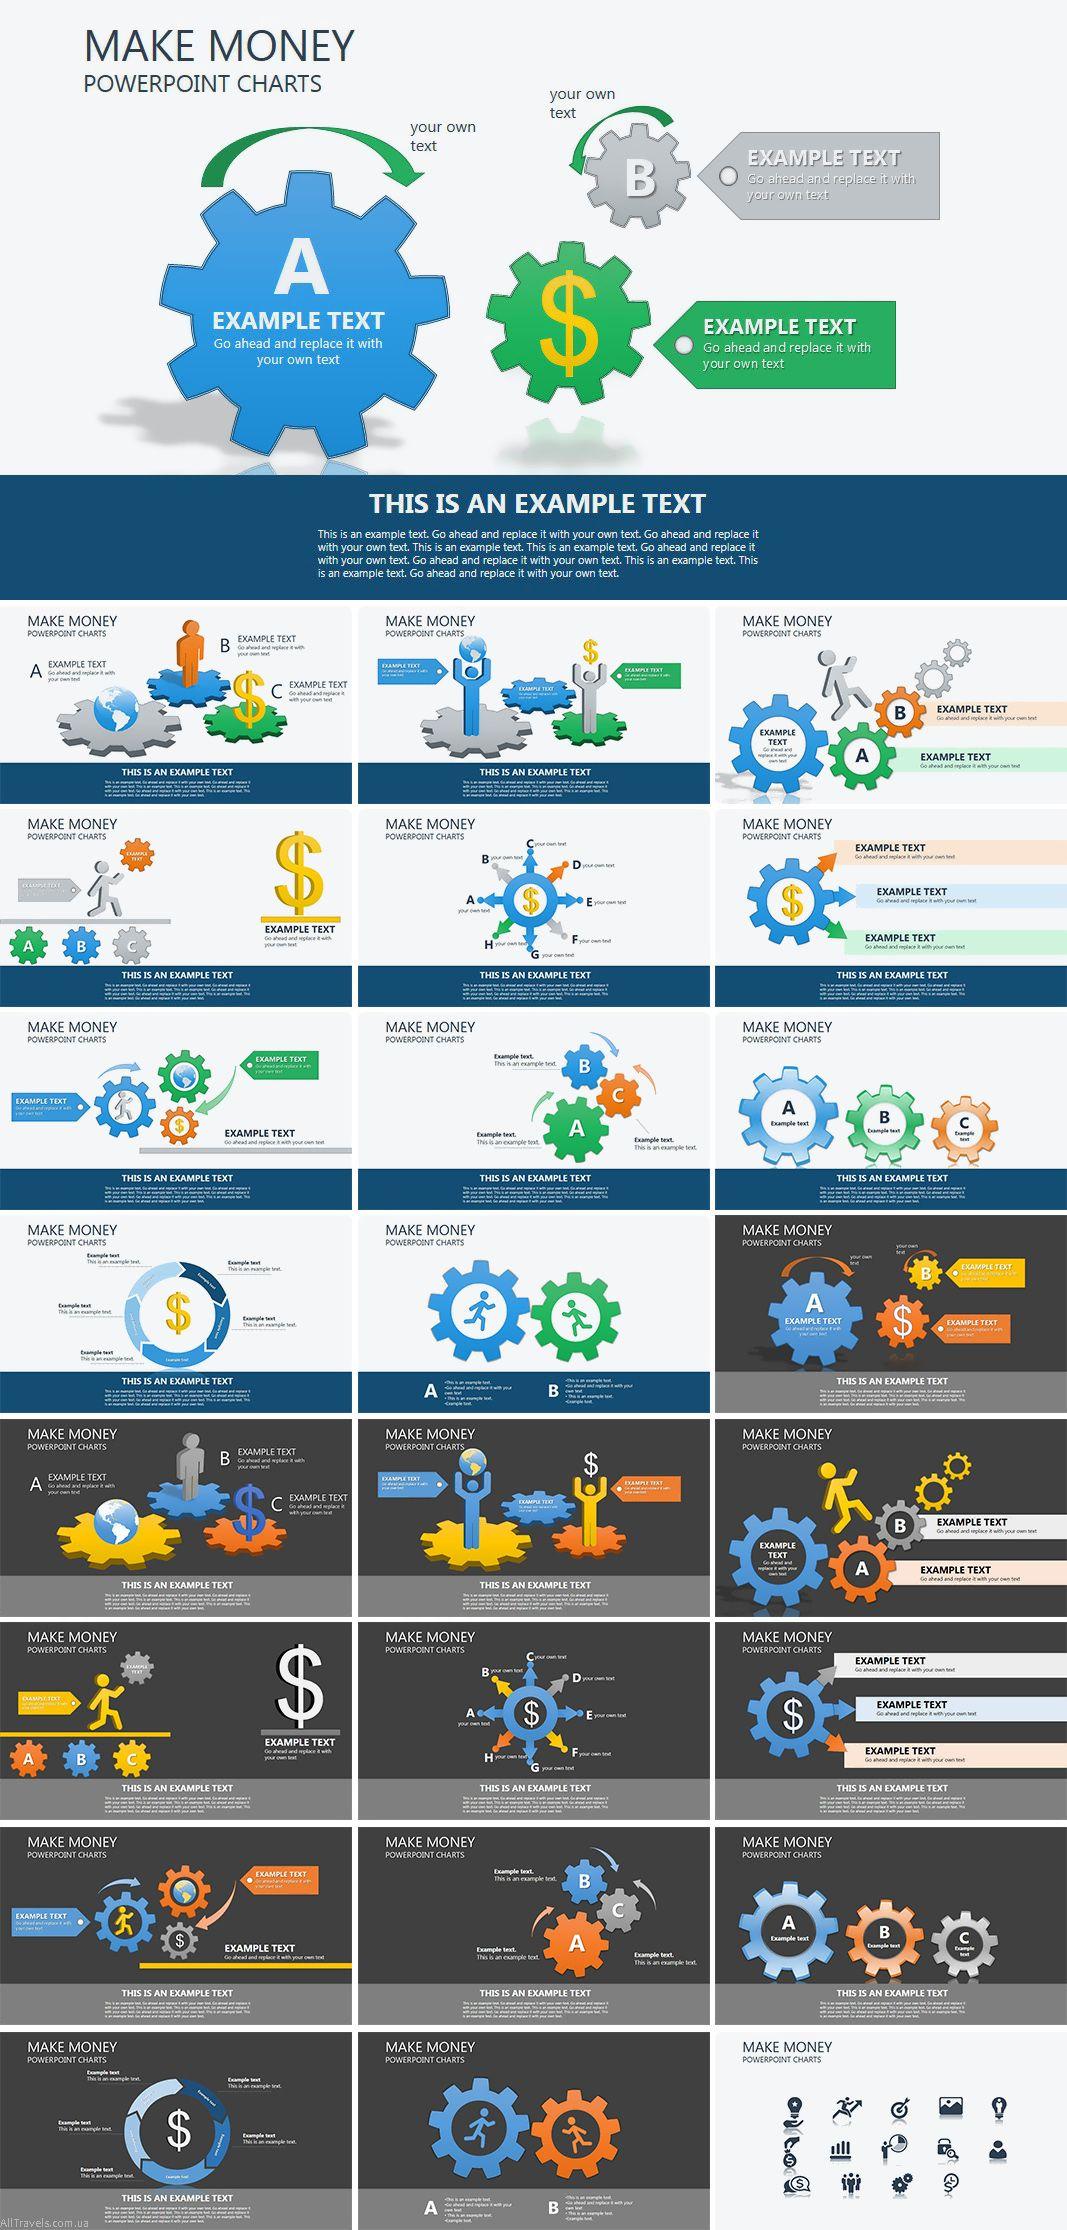 Company Organization PowerPoint charts